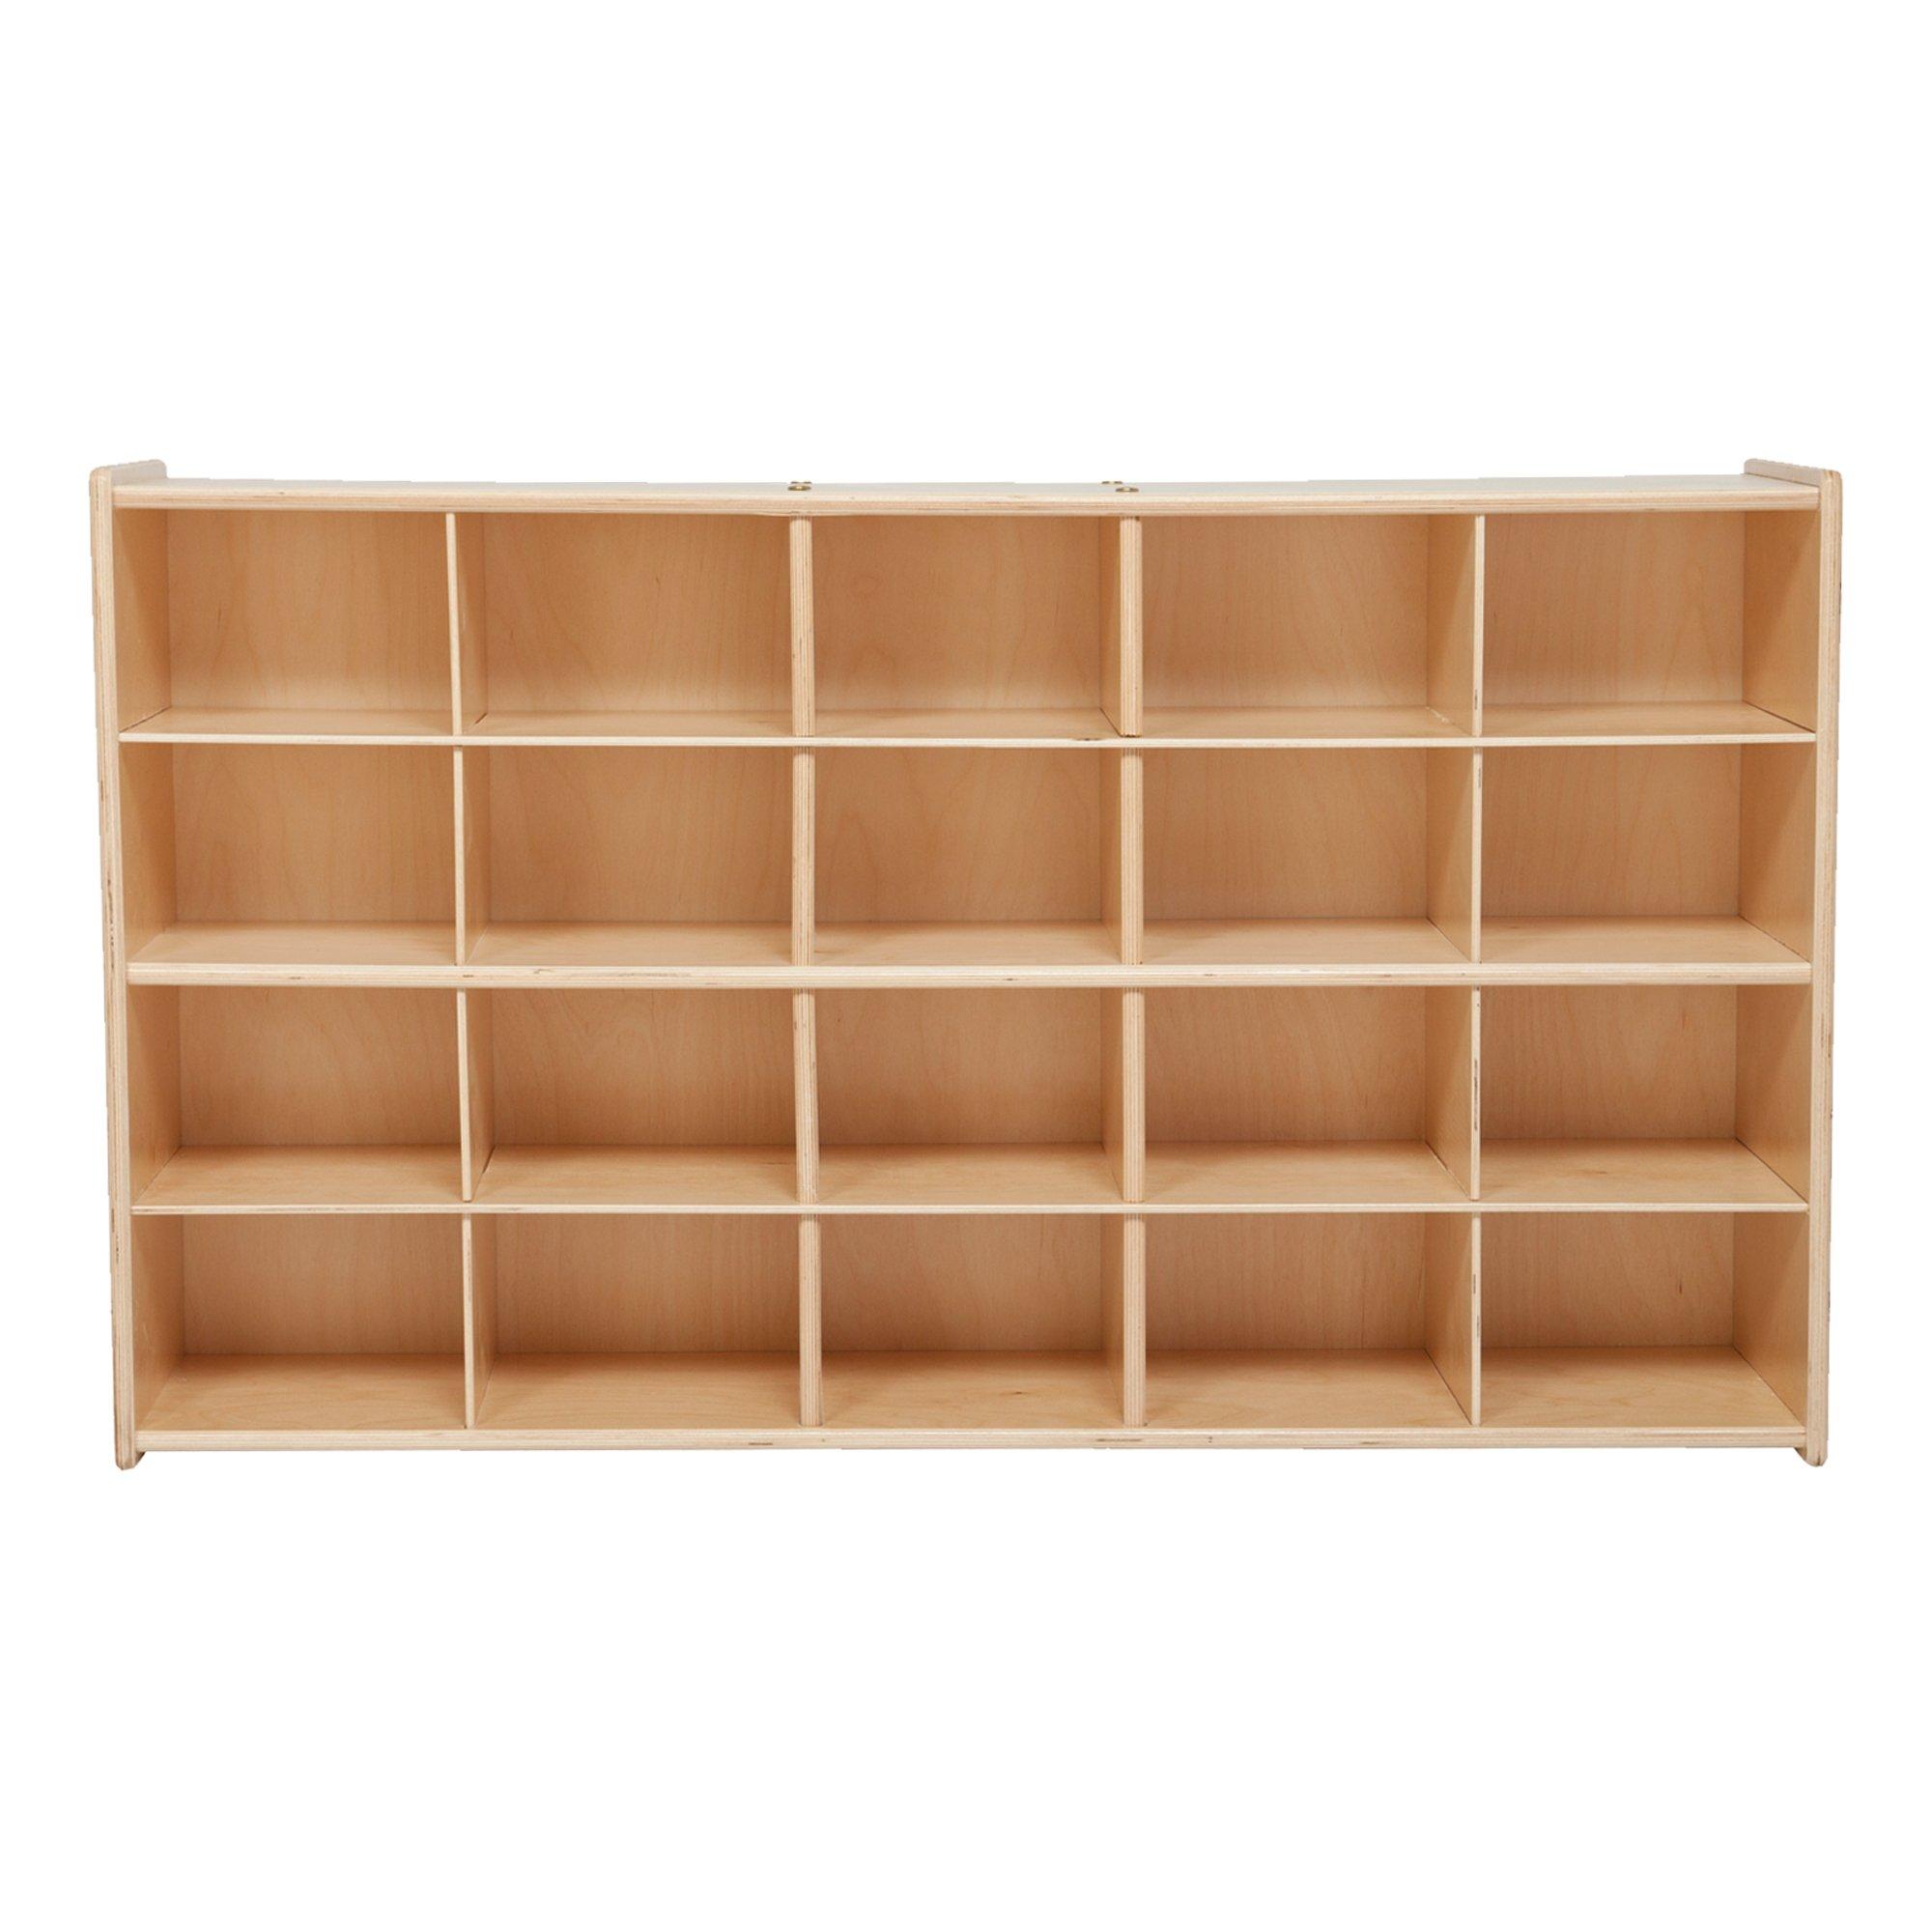 Sprogs 20-Tray Wooden Storage Unit - Unassembled, SPG-70930